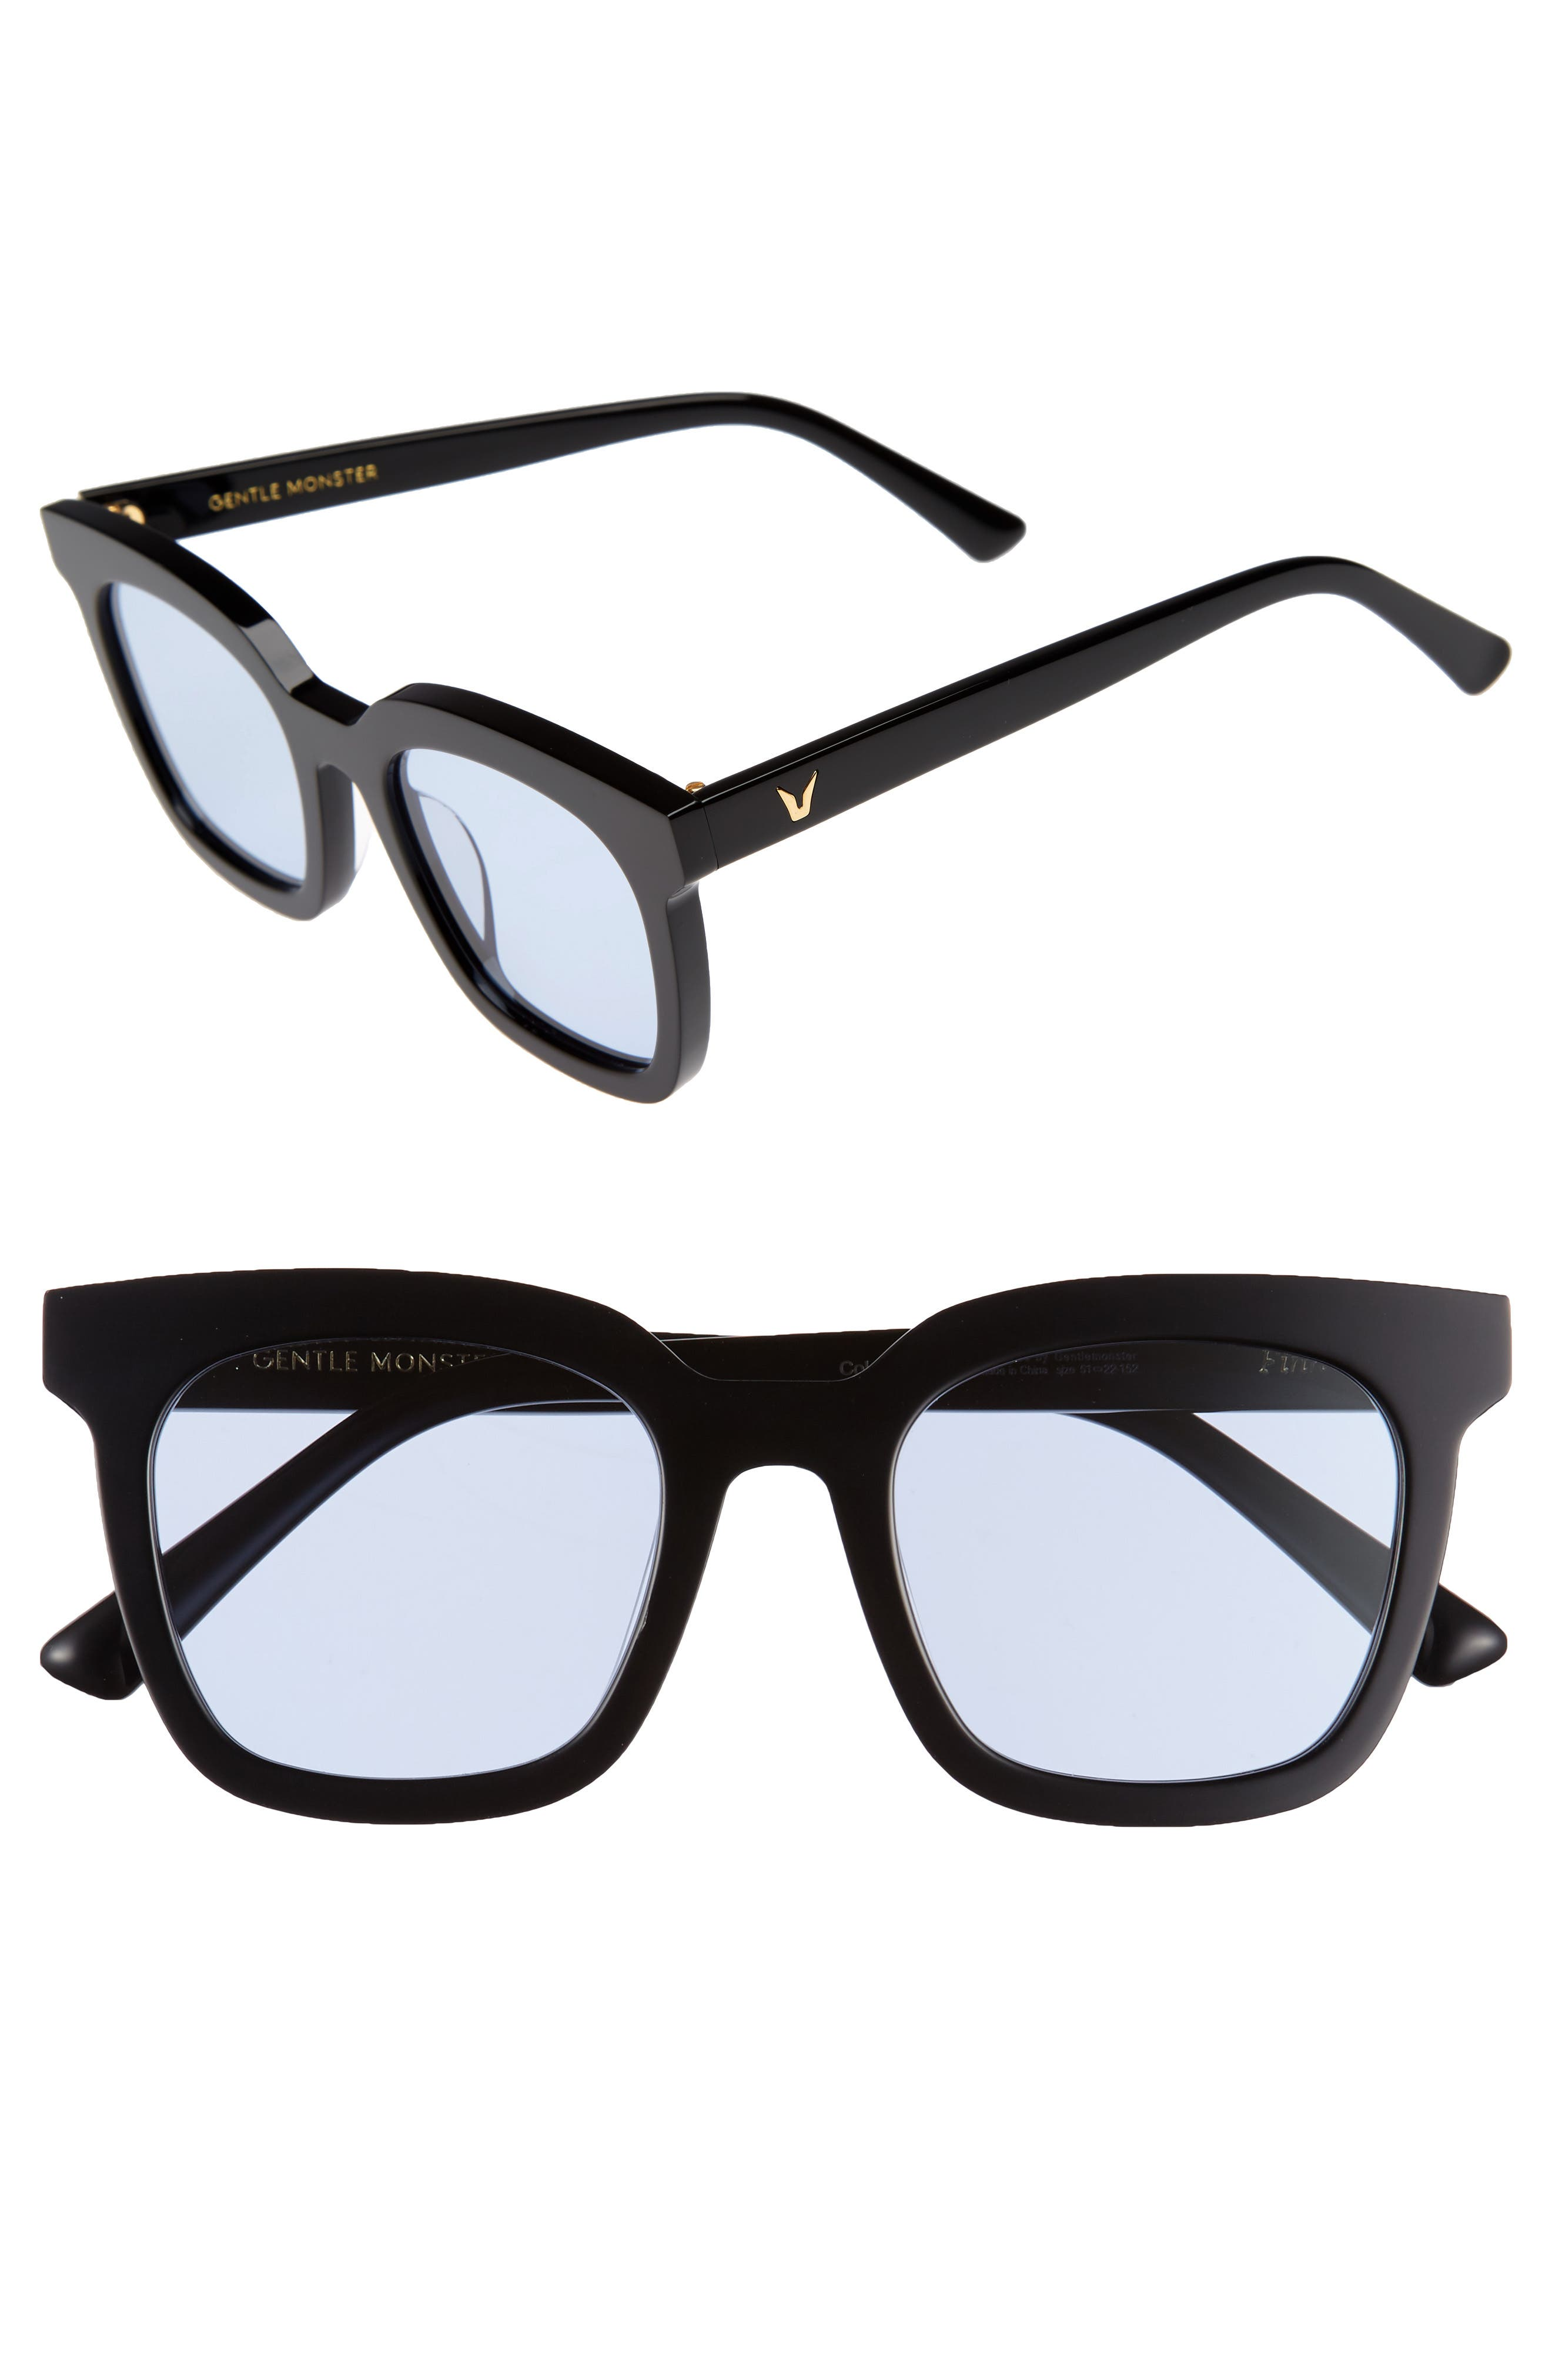 Finn 51mm Sunglasses,                             Main thumbnail 1, color,                             001